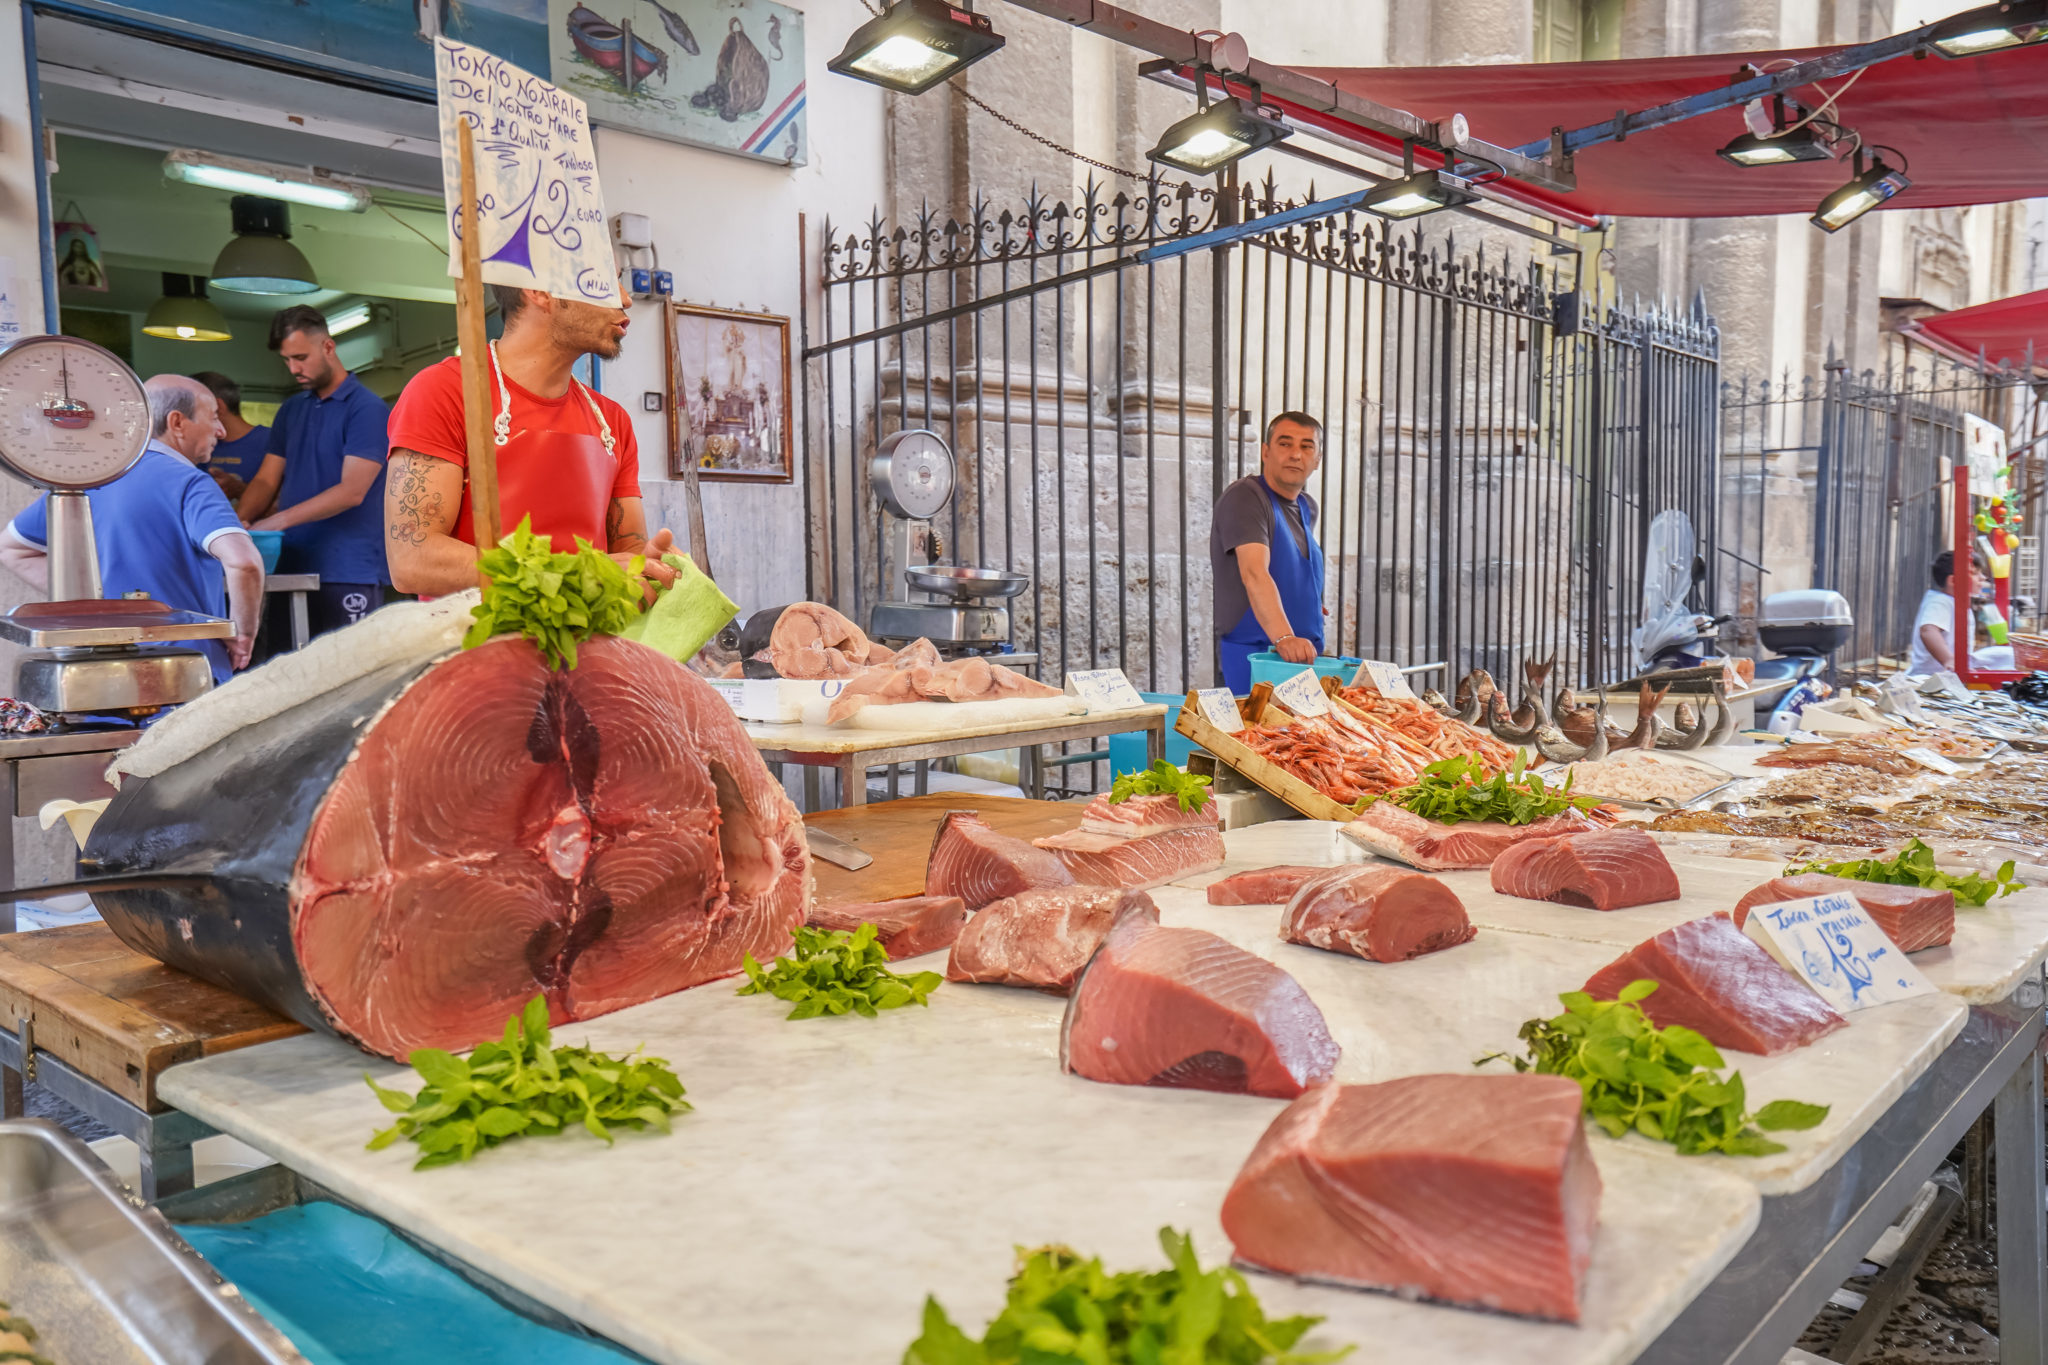 marché-Mercato-capo-palerme-sicile-italie.jpg